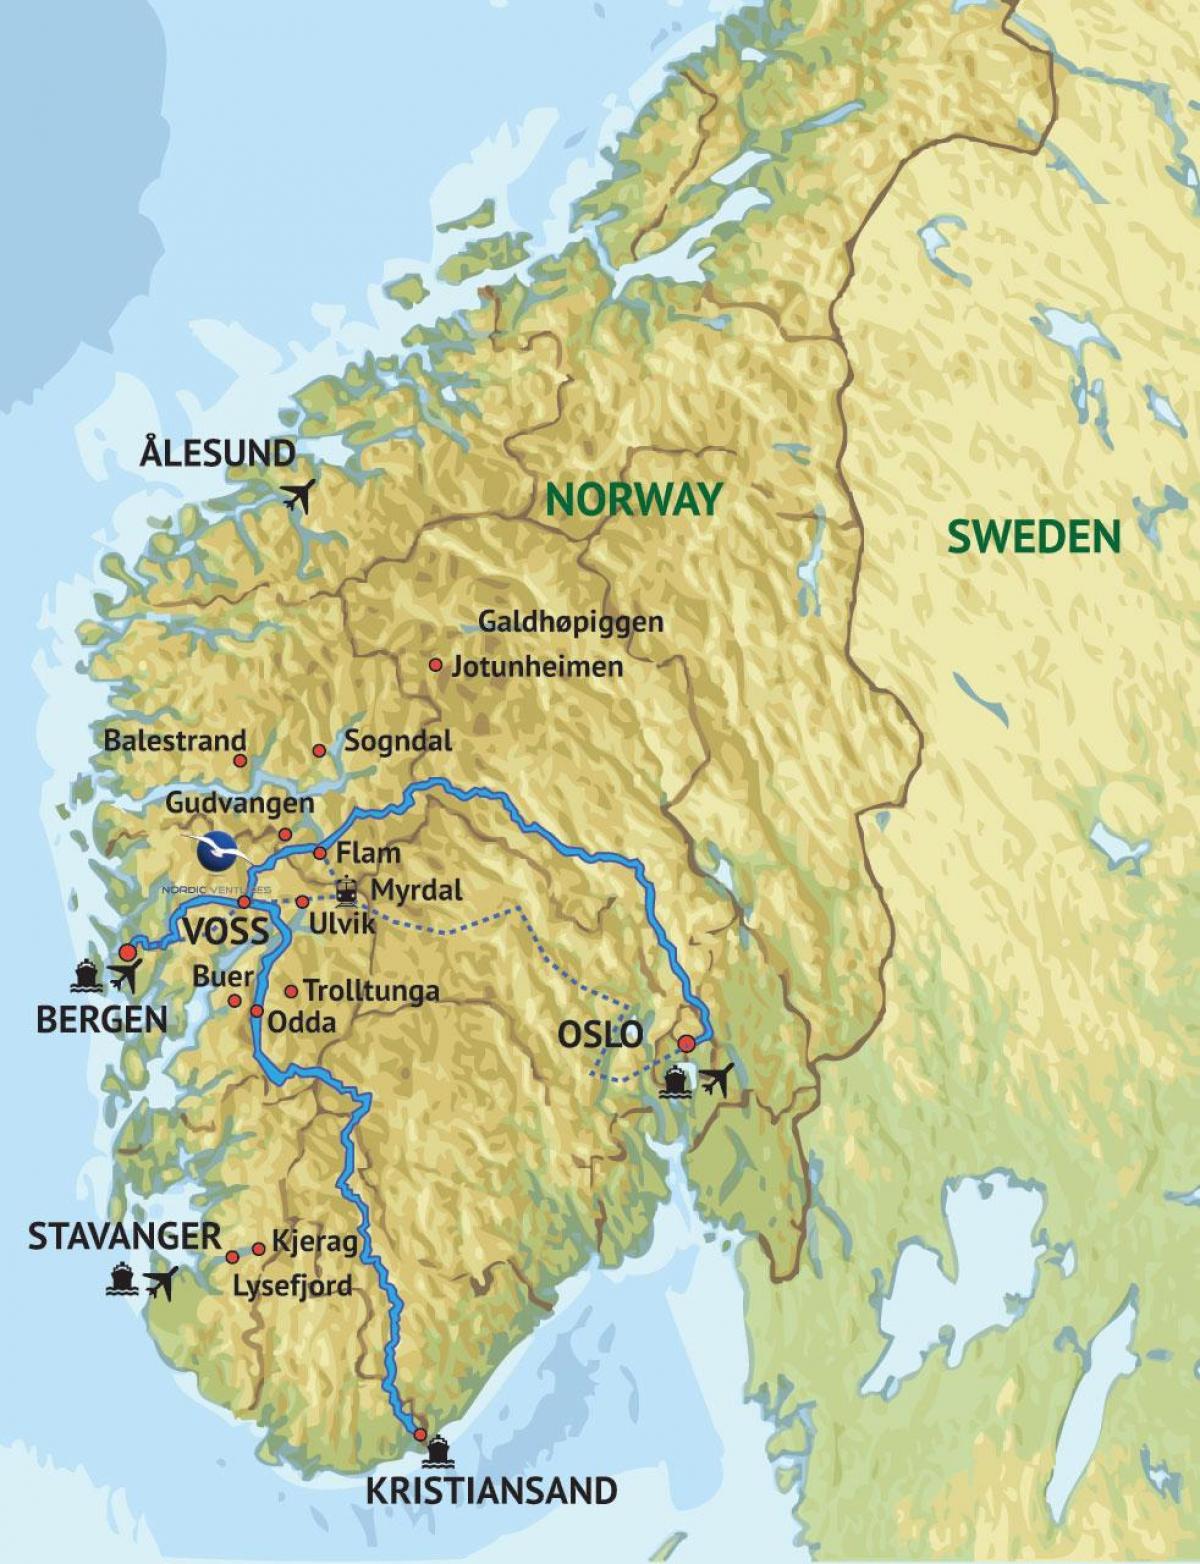 Kartta Lansi Norja Kartta Lansi Norjassa Pohjois Eurooppa